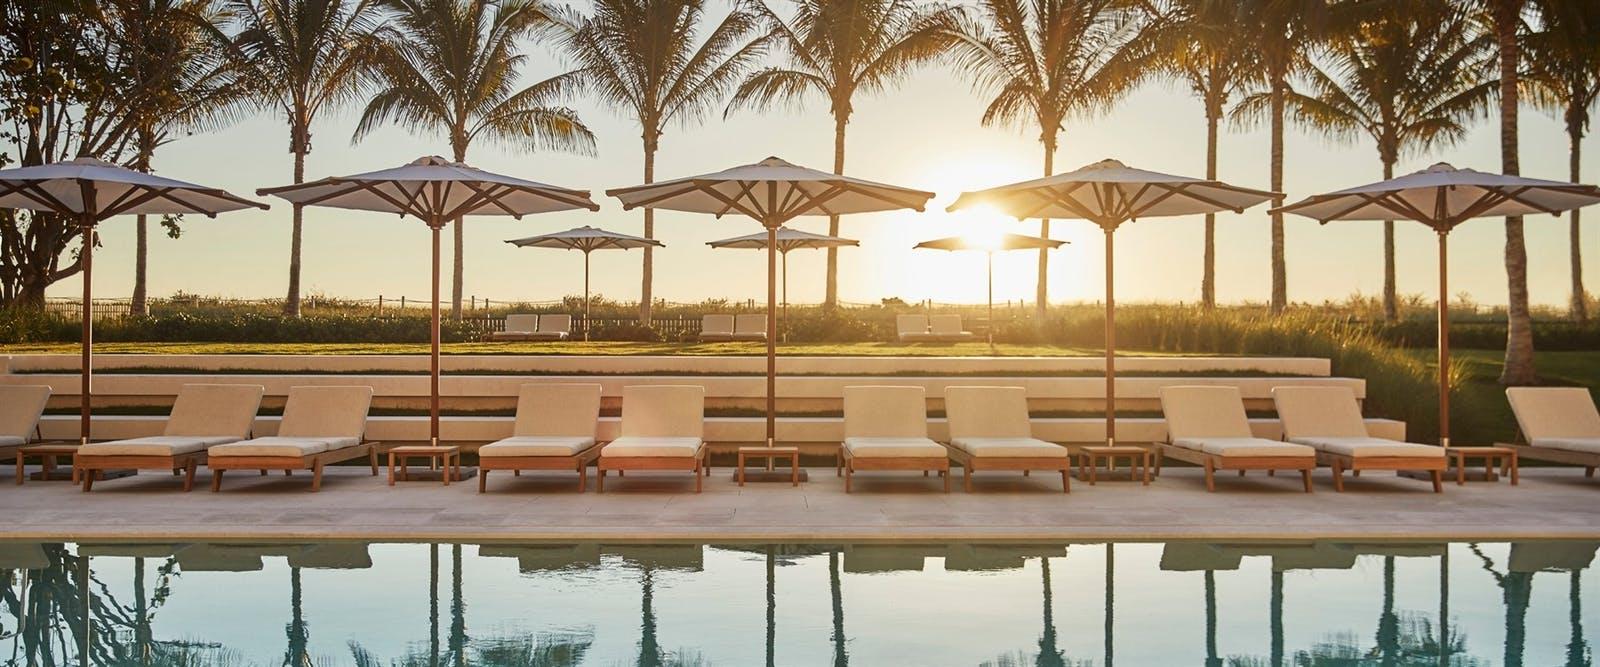 Four Seasons Hotel at The Surf Club | Five-star Miami Beach